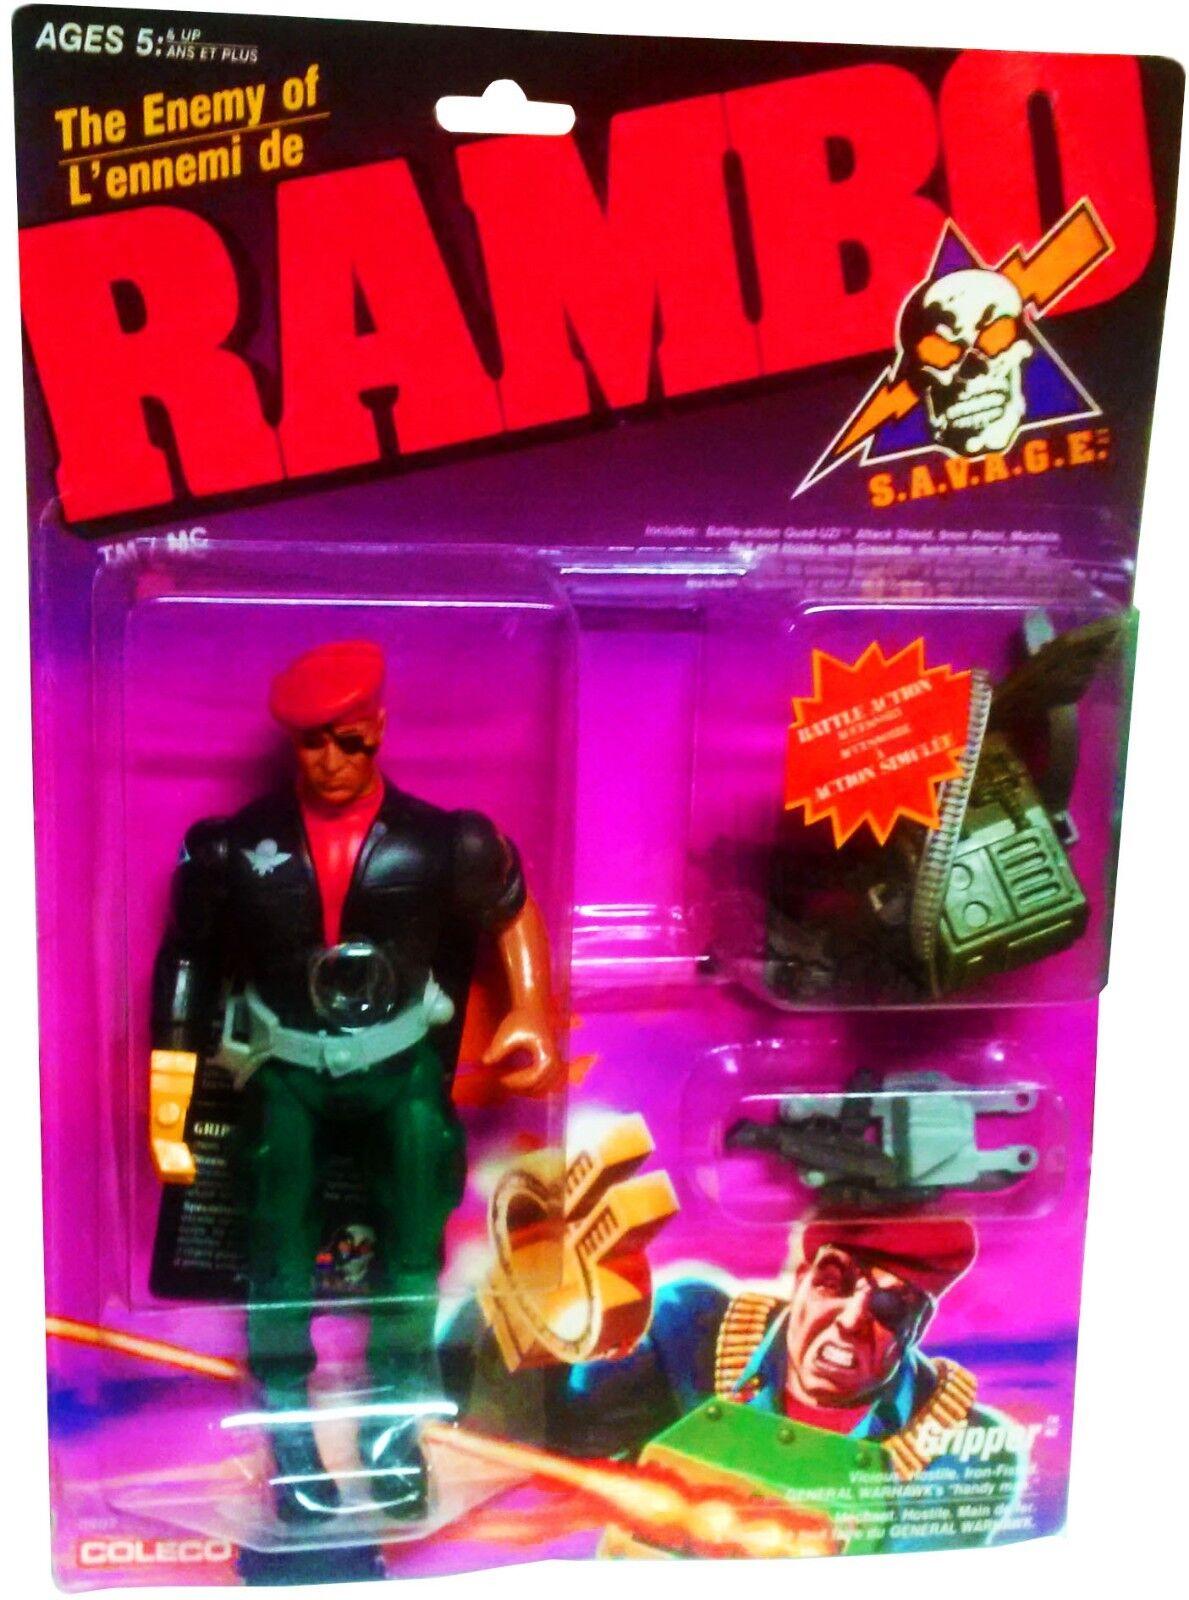 Rambo - S. a. V. a. G.E The Enemy Of Rambo - Greifer Figur - Neu  Mosc